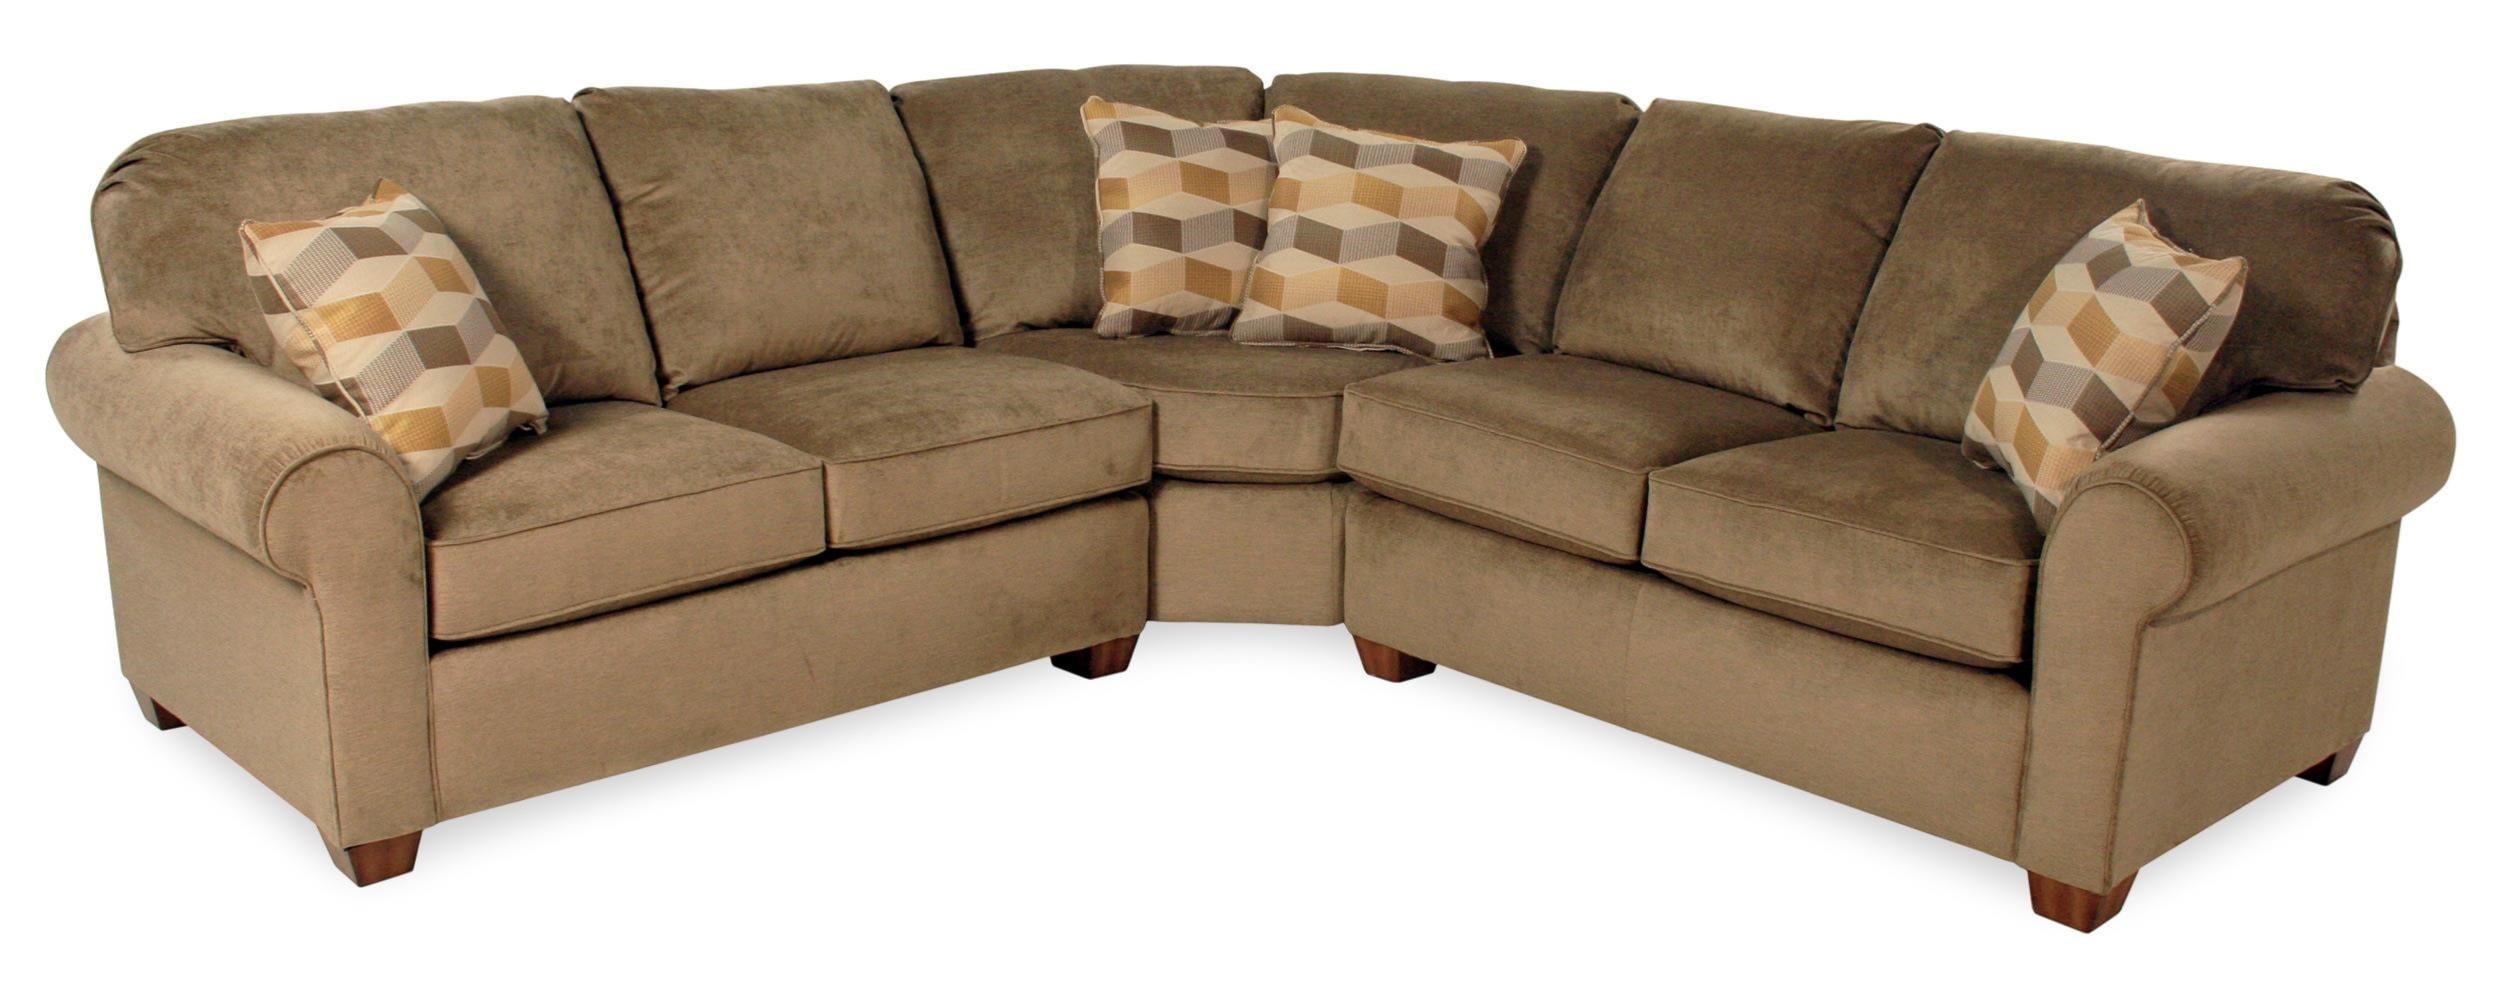 Flexsteel Thornton Sofa Price Flexsteel Furniture Vail  : products2Fflexsteel2Fcolor2Fthornton205535s5535 272823 bb2rhorktwkk9lhsgnm2ltwjpgscalebothampwidth500ampheight500ampfsharpen25ampdown from thesofa.droogkast.com size 500 x 500 jpeg 22kB